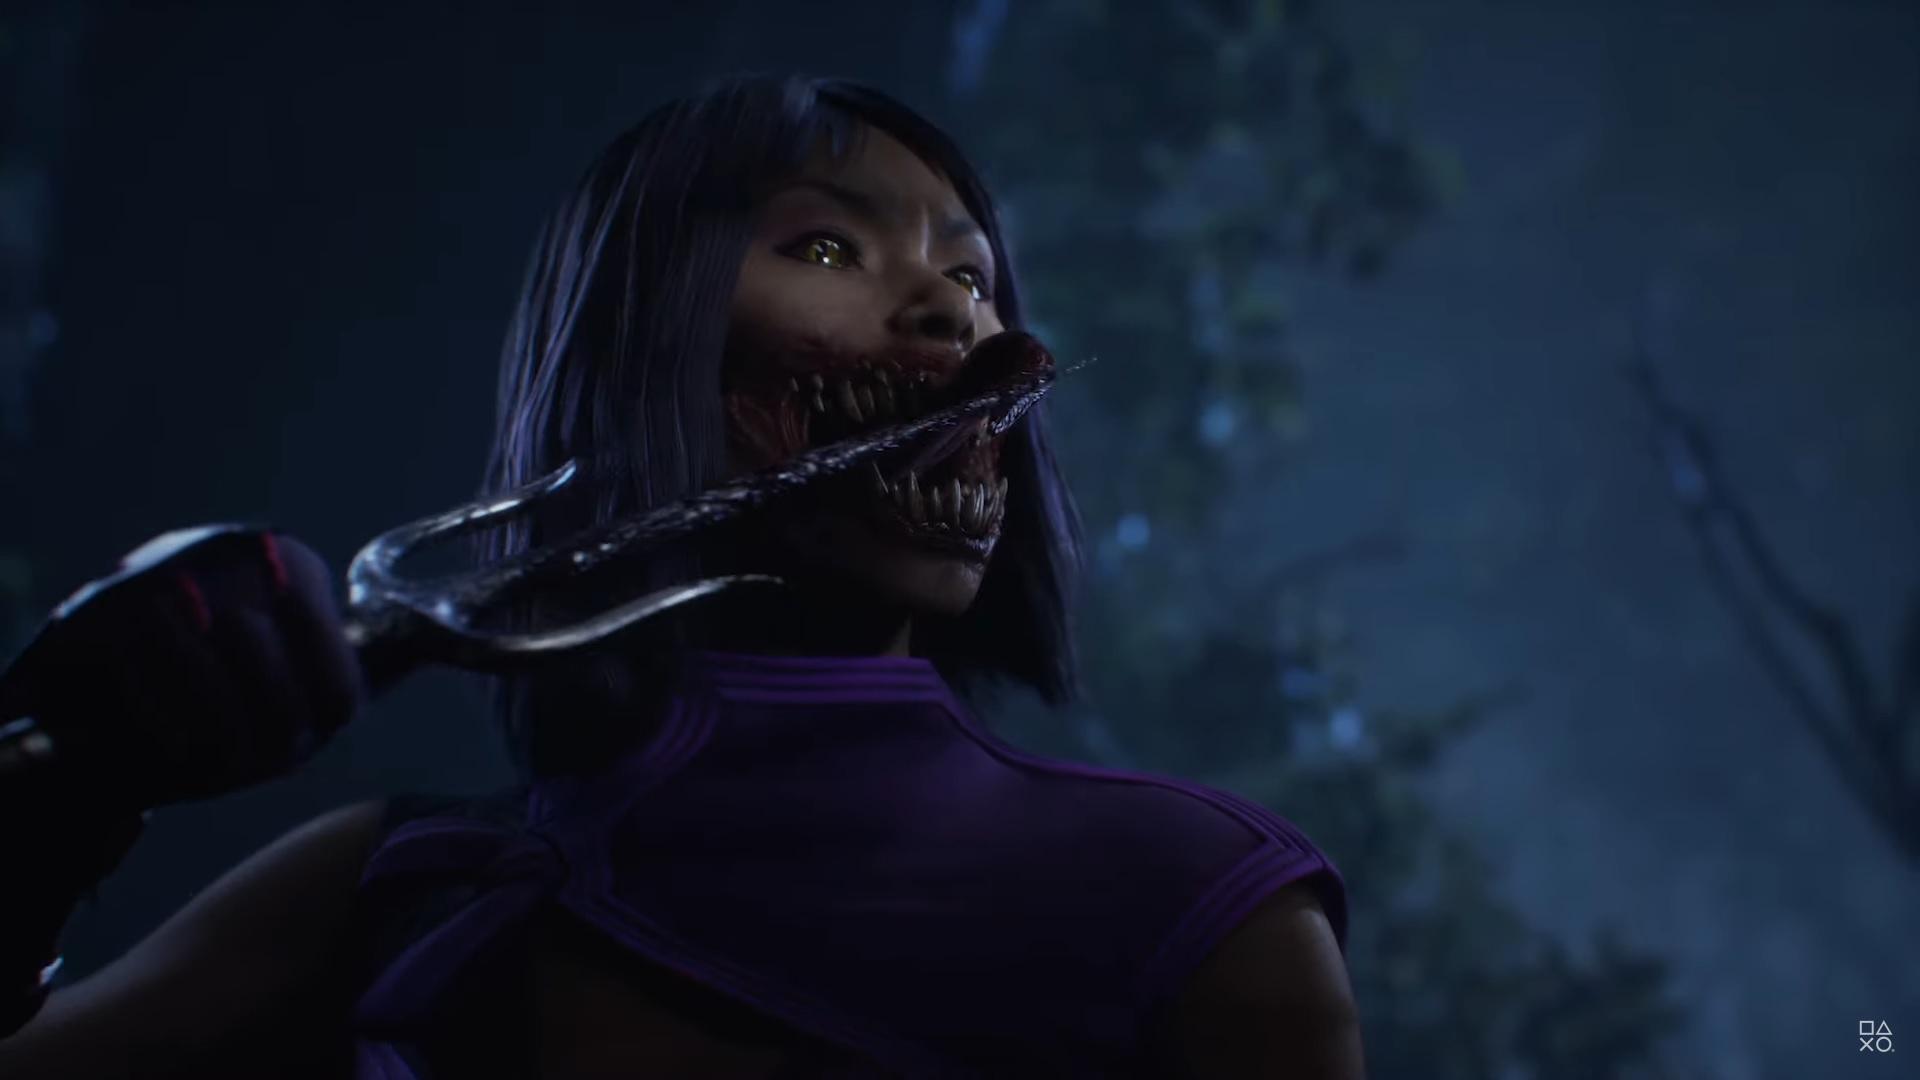 Mortal Kombat 11: Aftermath Adds Rambo as DLC Character